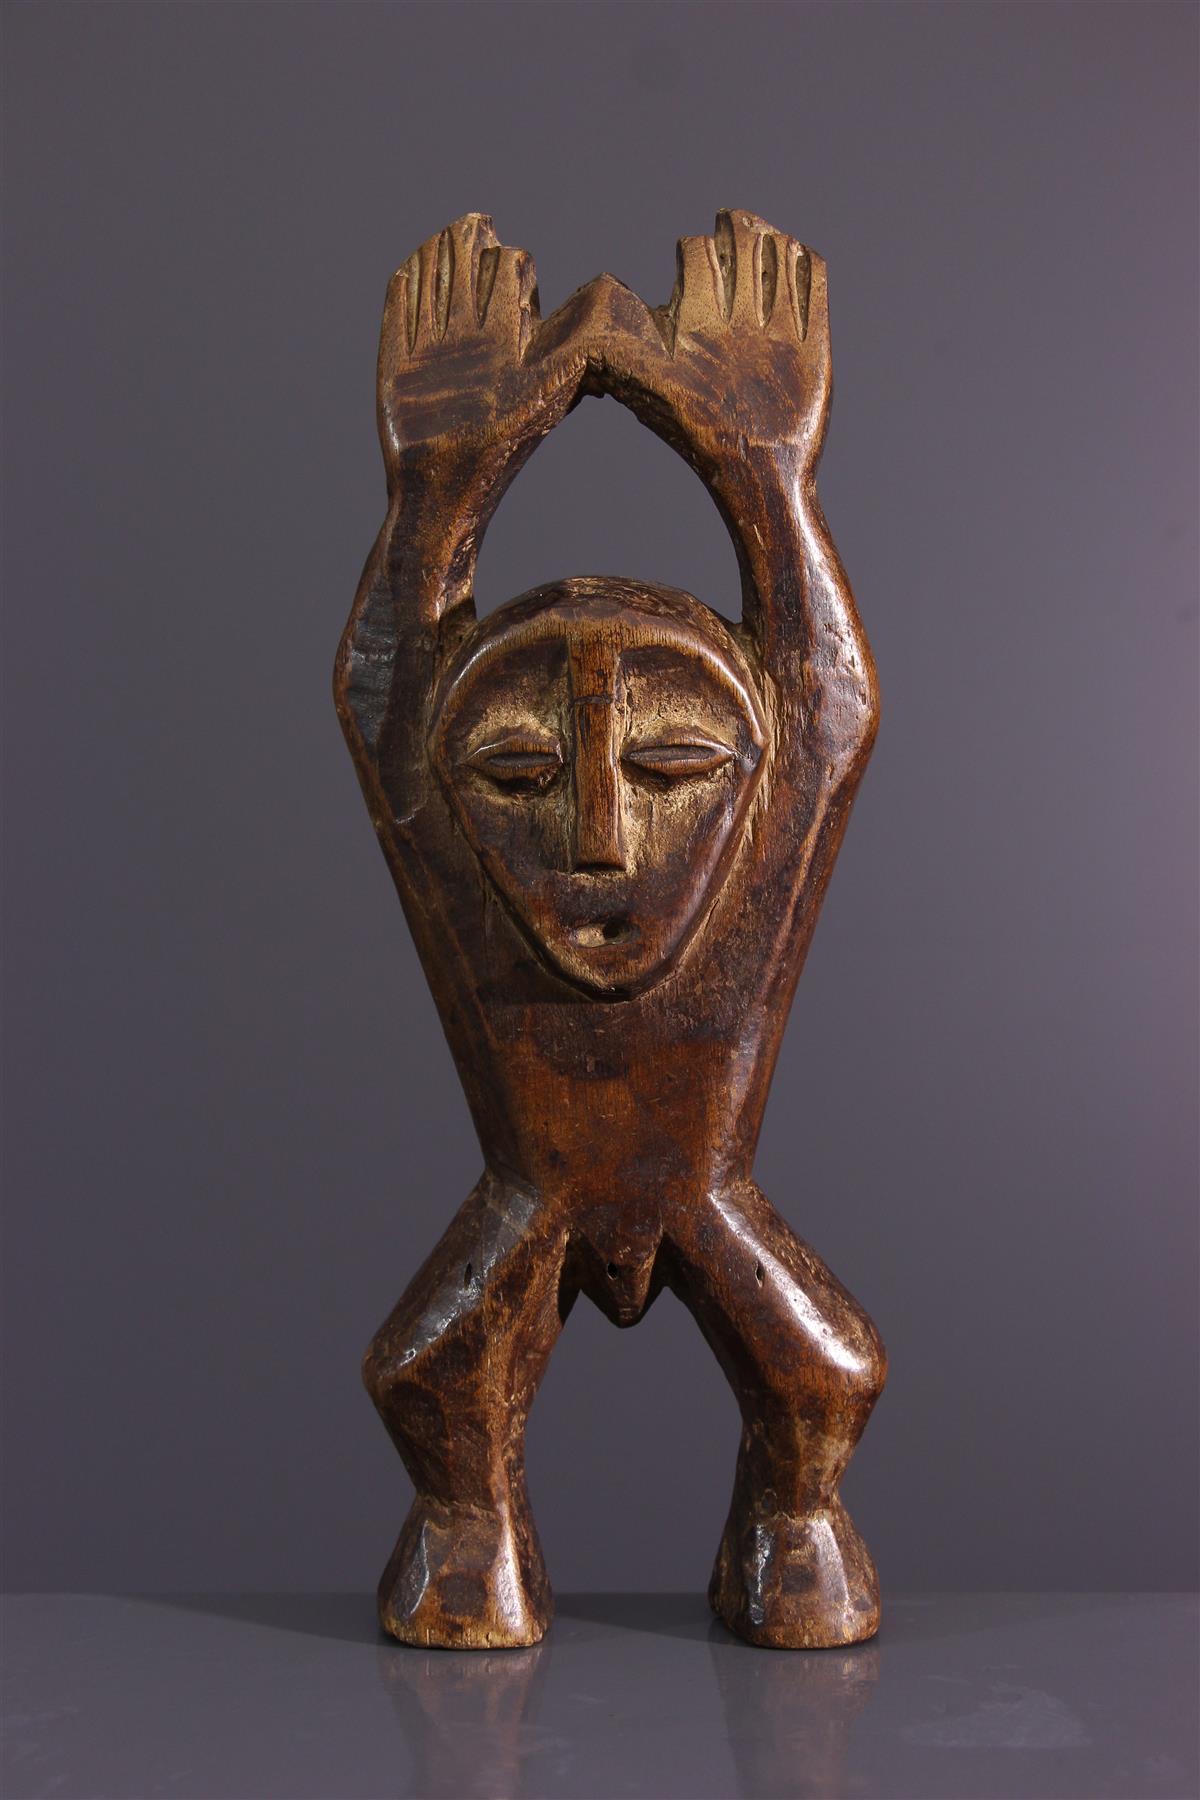 League Beeldjes - Afrikaanse kunst